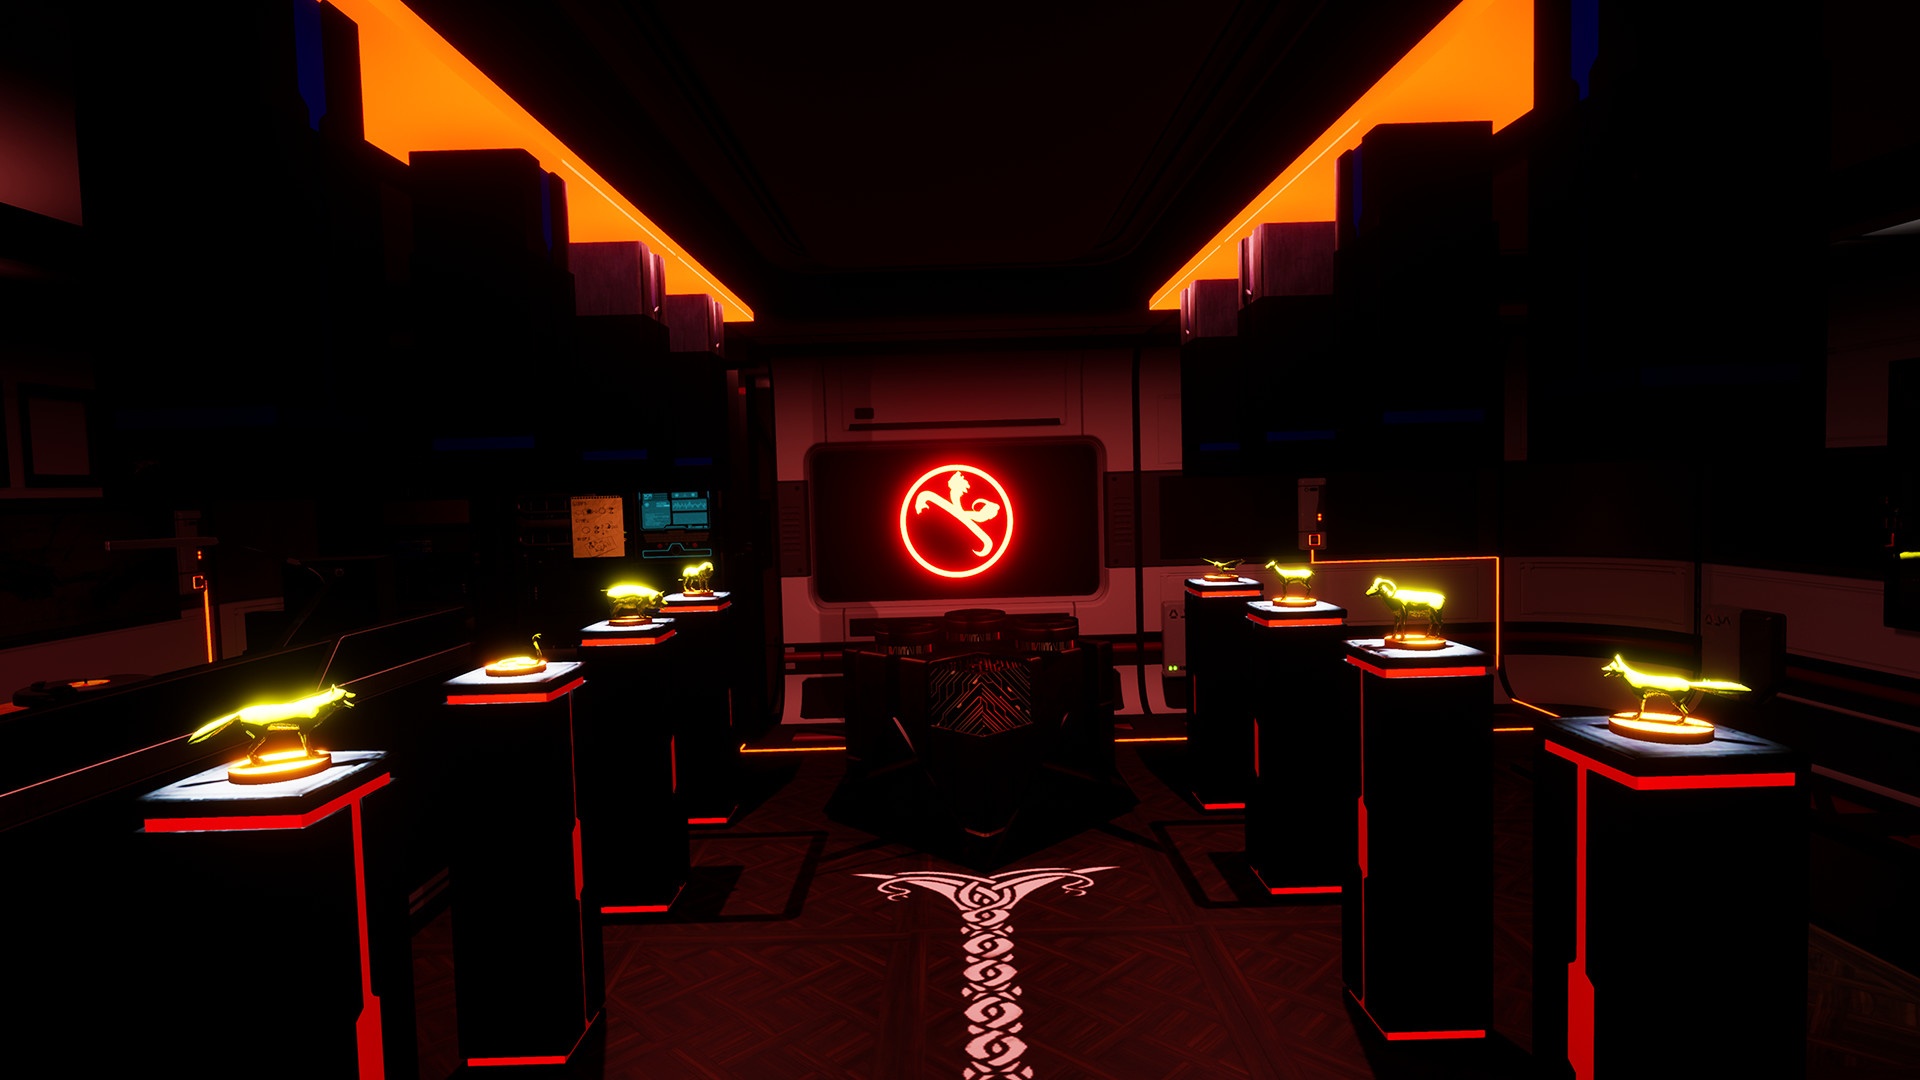 Oculus Quest 游戏《DEUS EX MACHINA: Episode 1》密室逃脱:第 1 集插图(1)